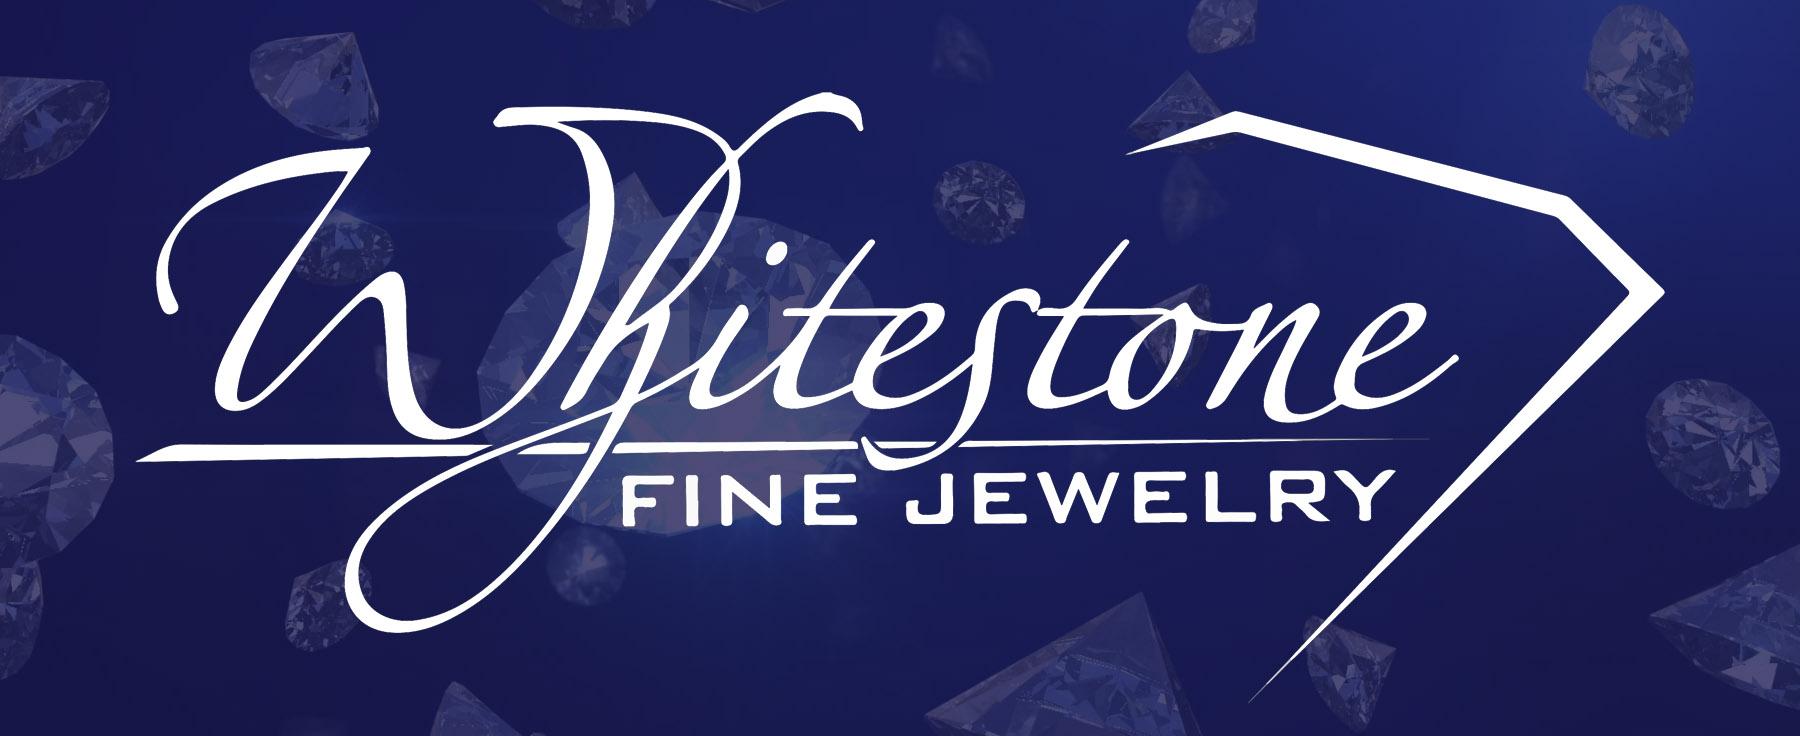 Whitestone Fine Jewelry web design